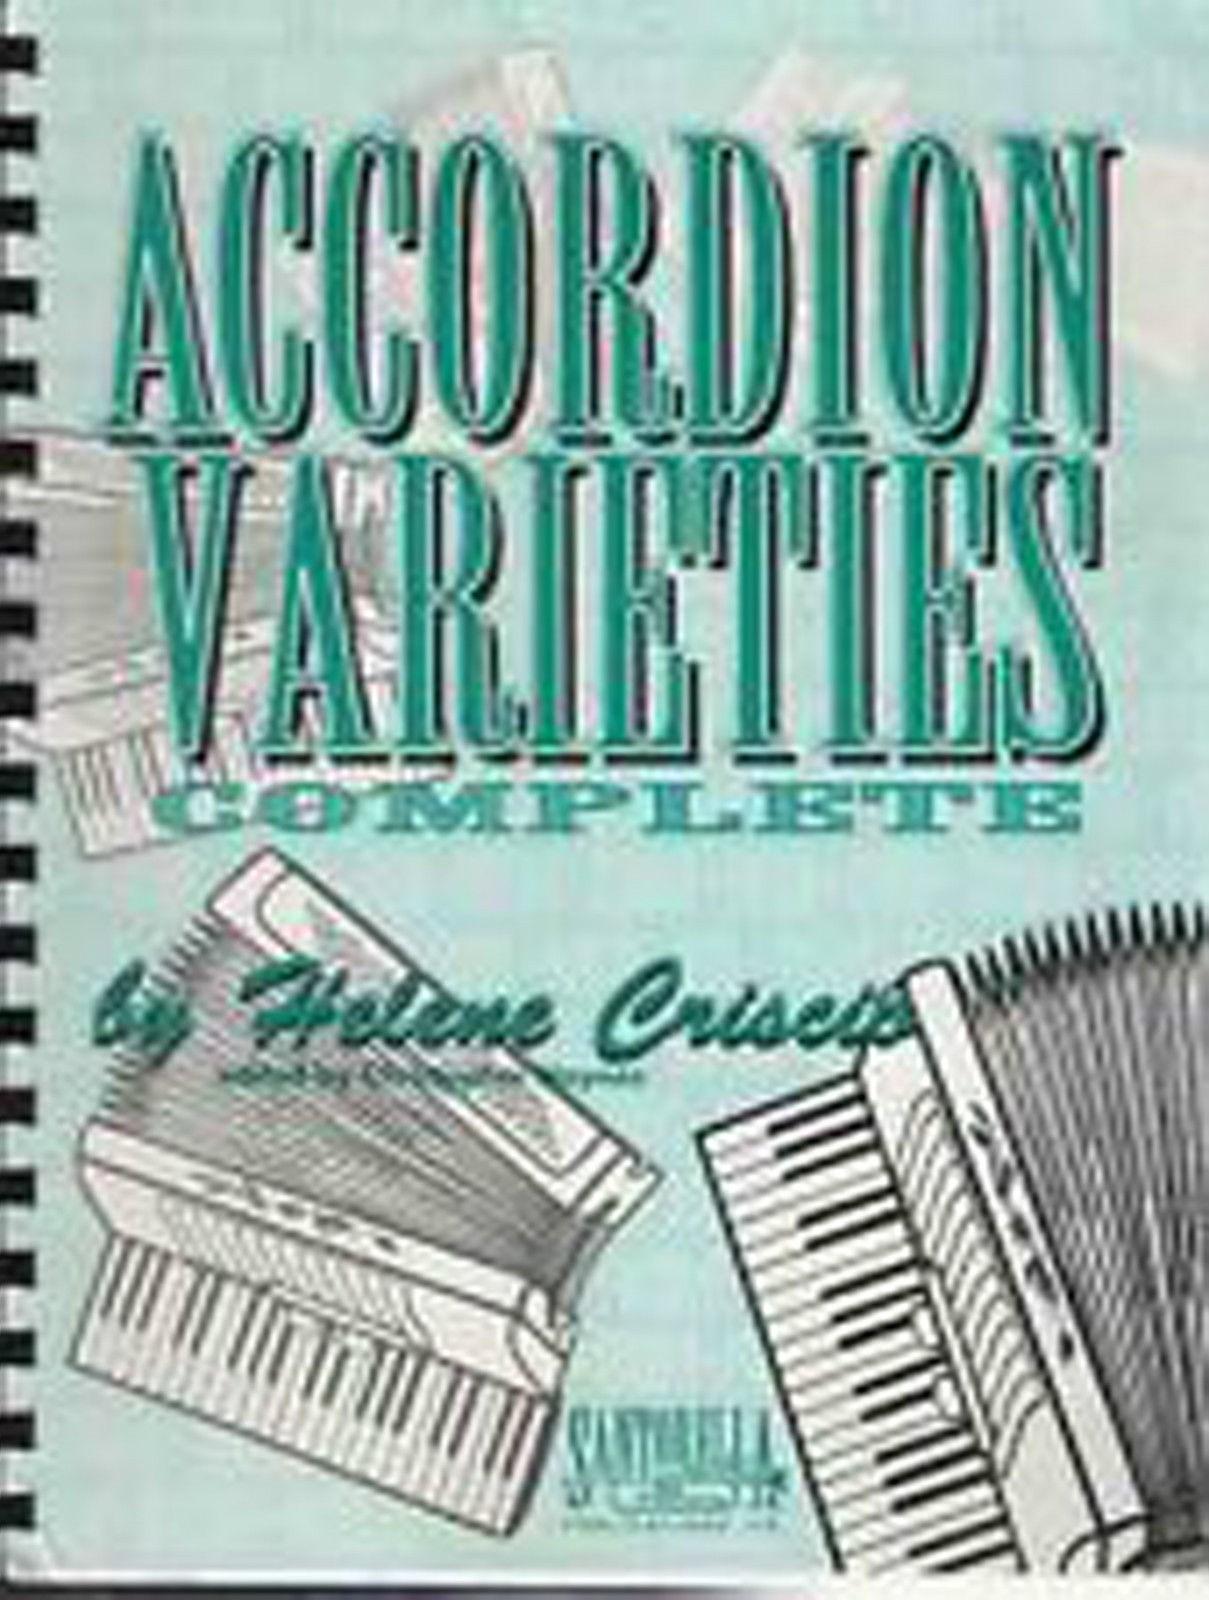 Accordion Varieties Complete Book Helene Criscio Alpine Polkas Waltz & Songs B52